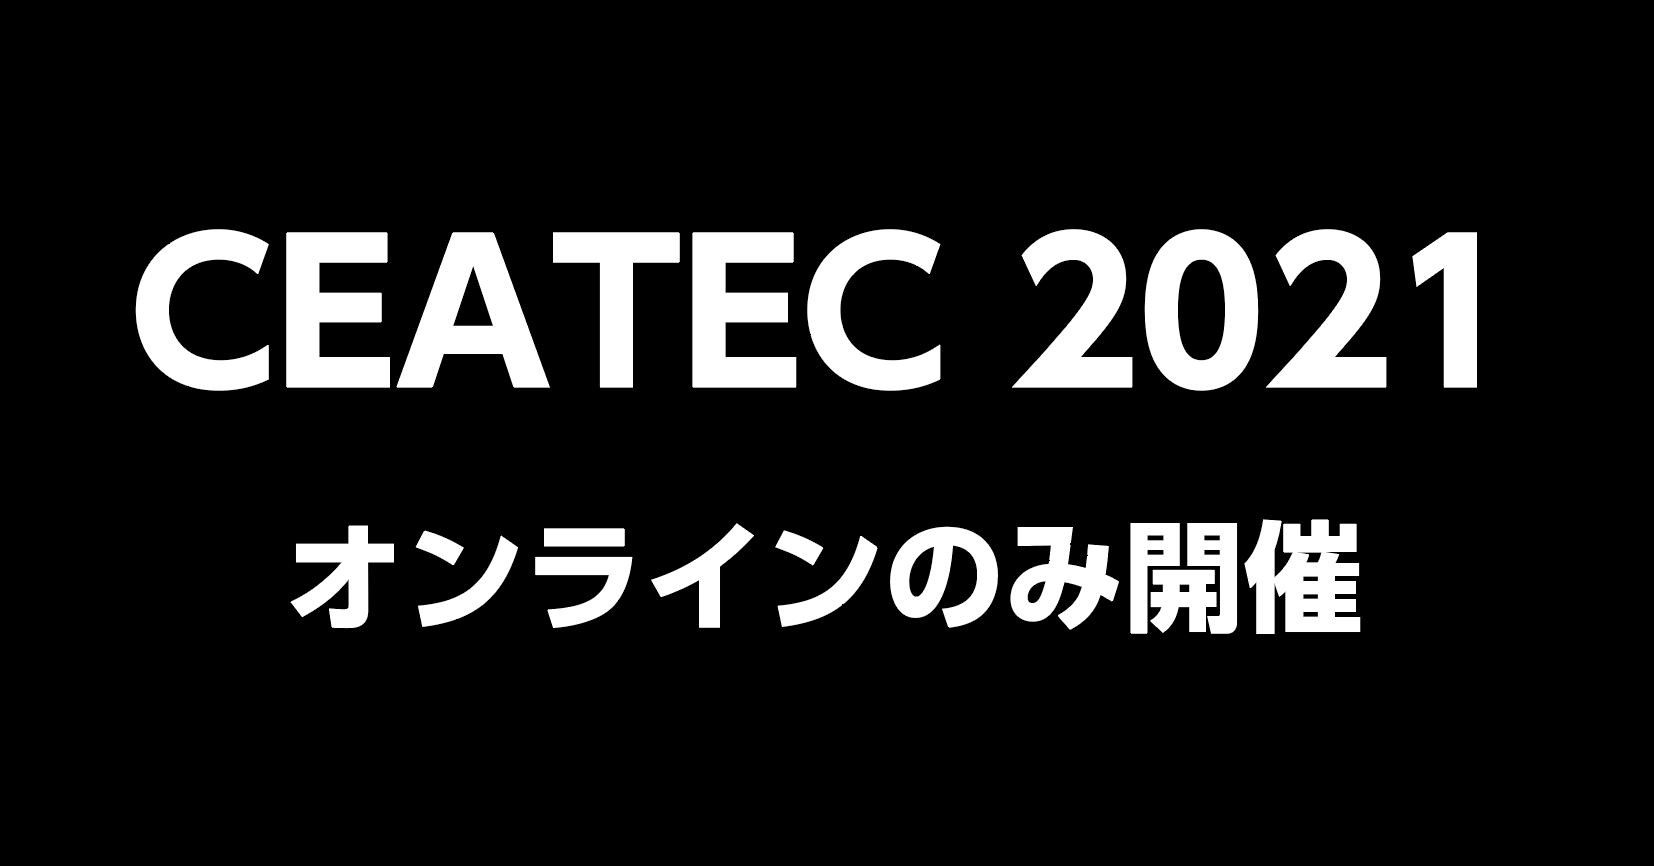 CEATEC 2021 オンラインのみで開催の画像